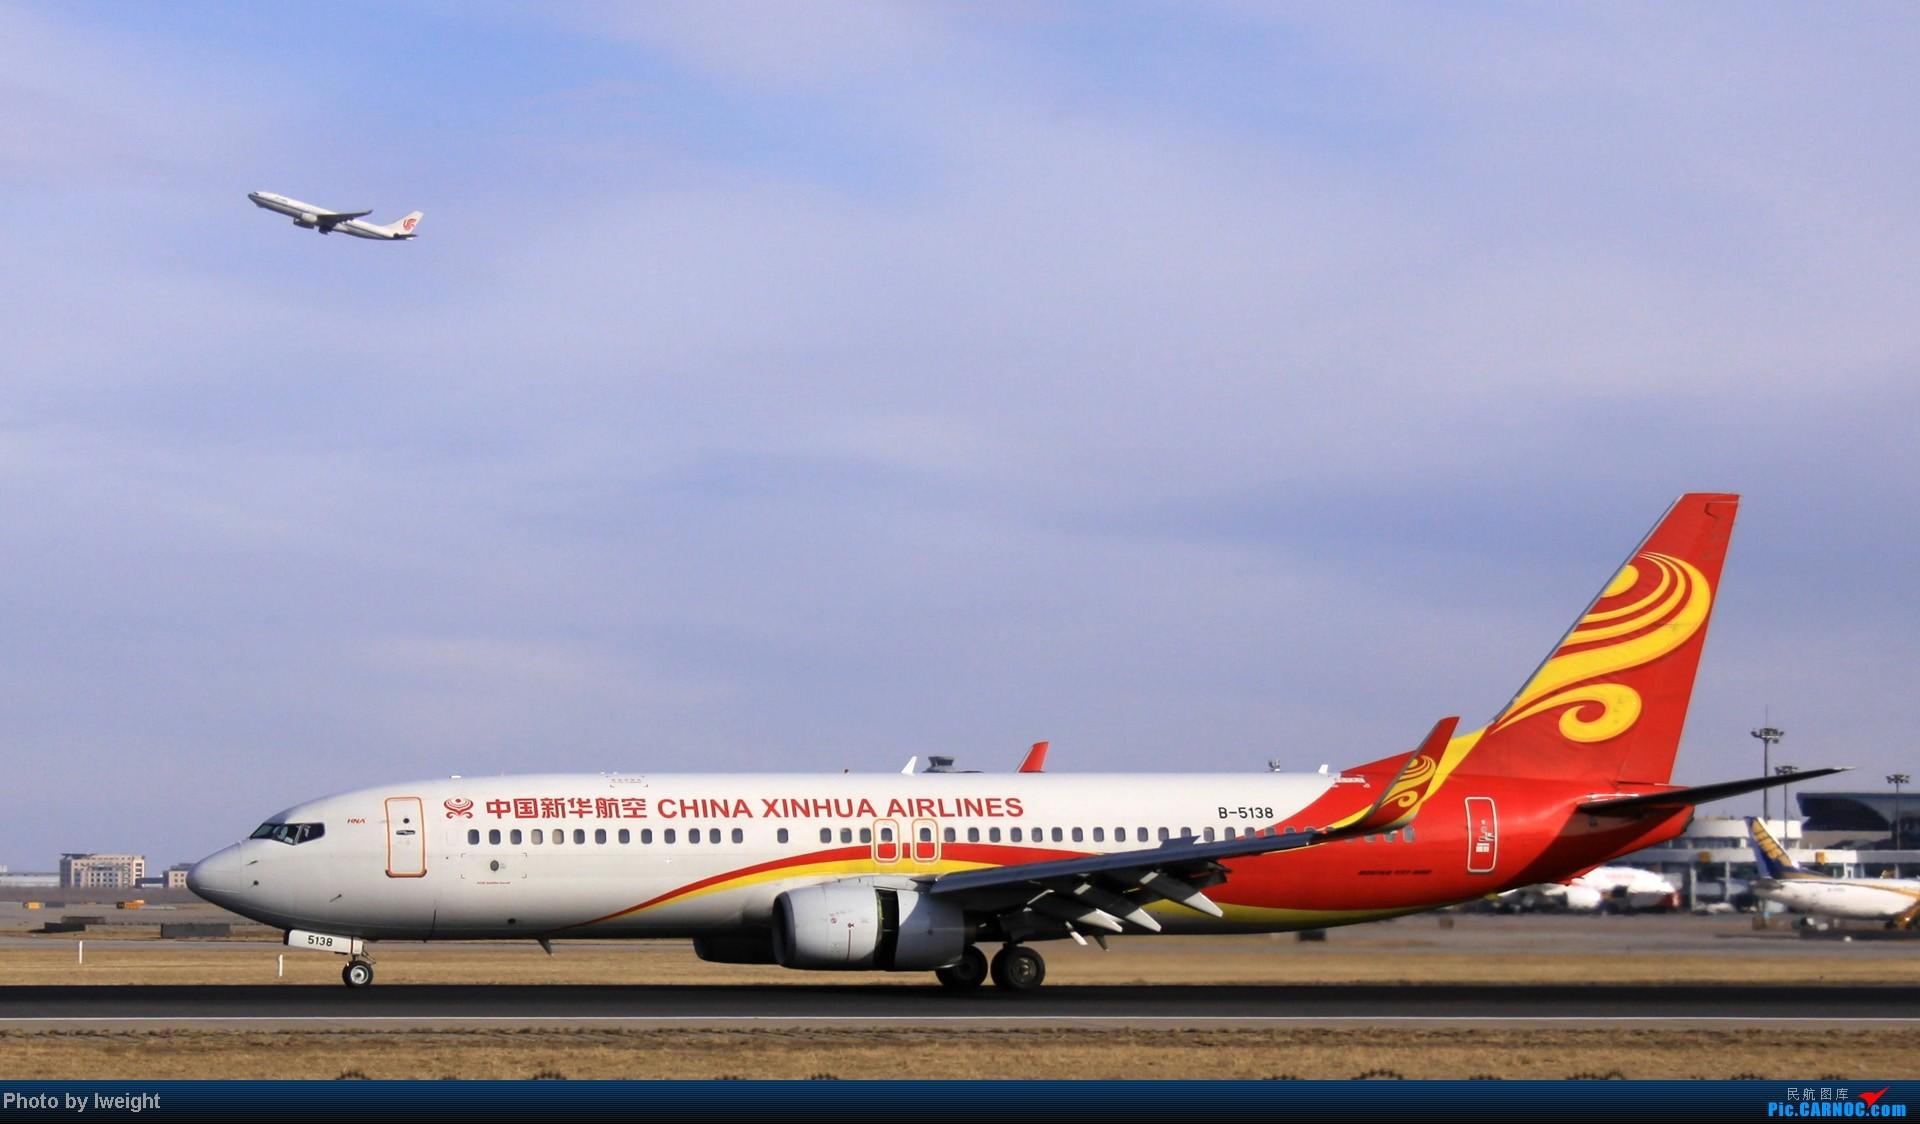 Re:[原创]今天下午瞎拍两个小时的杂图 BOEING 737-800 B-5138 中国北京首都机场